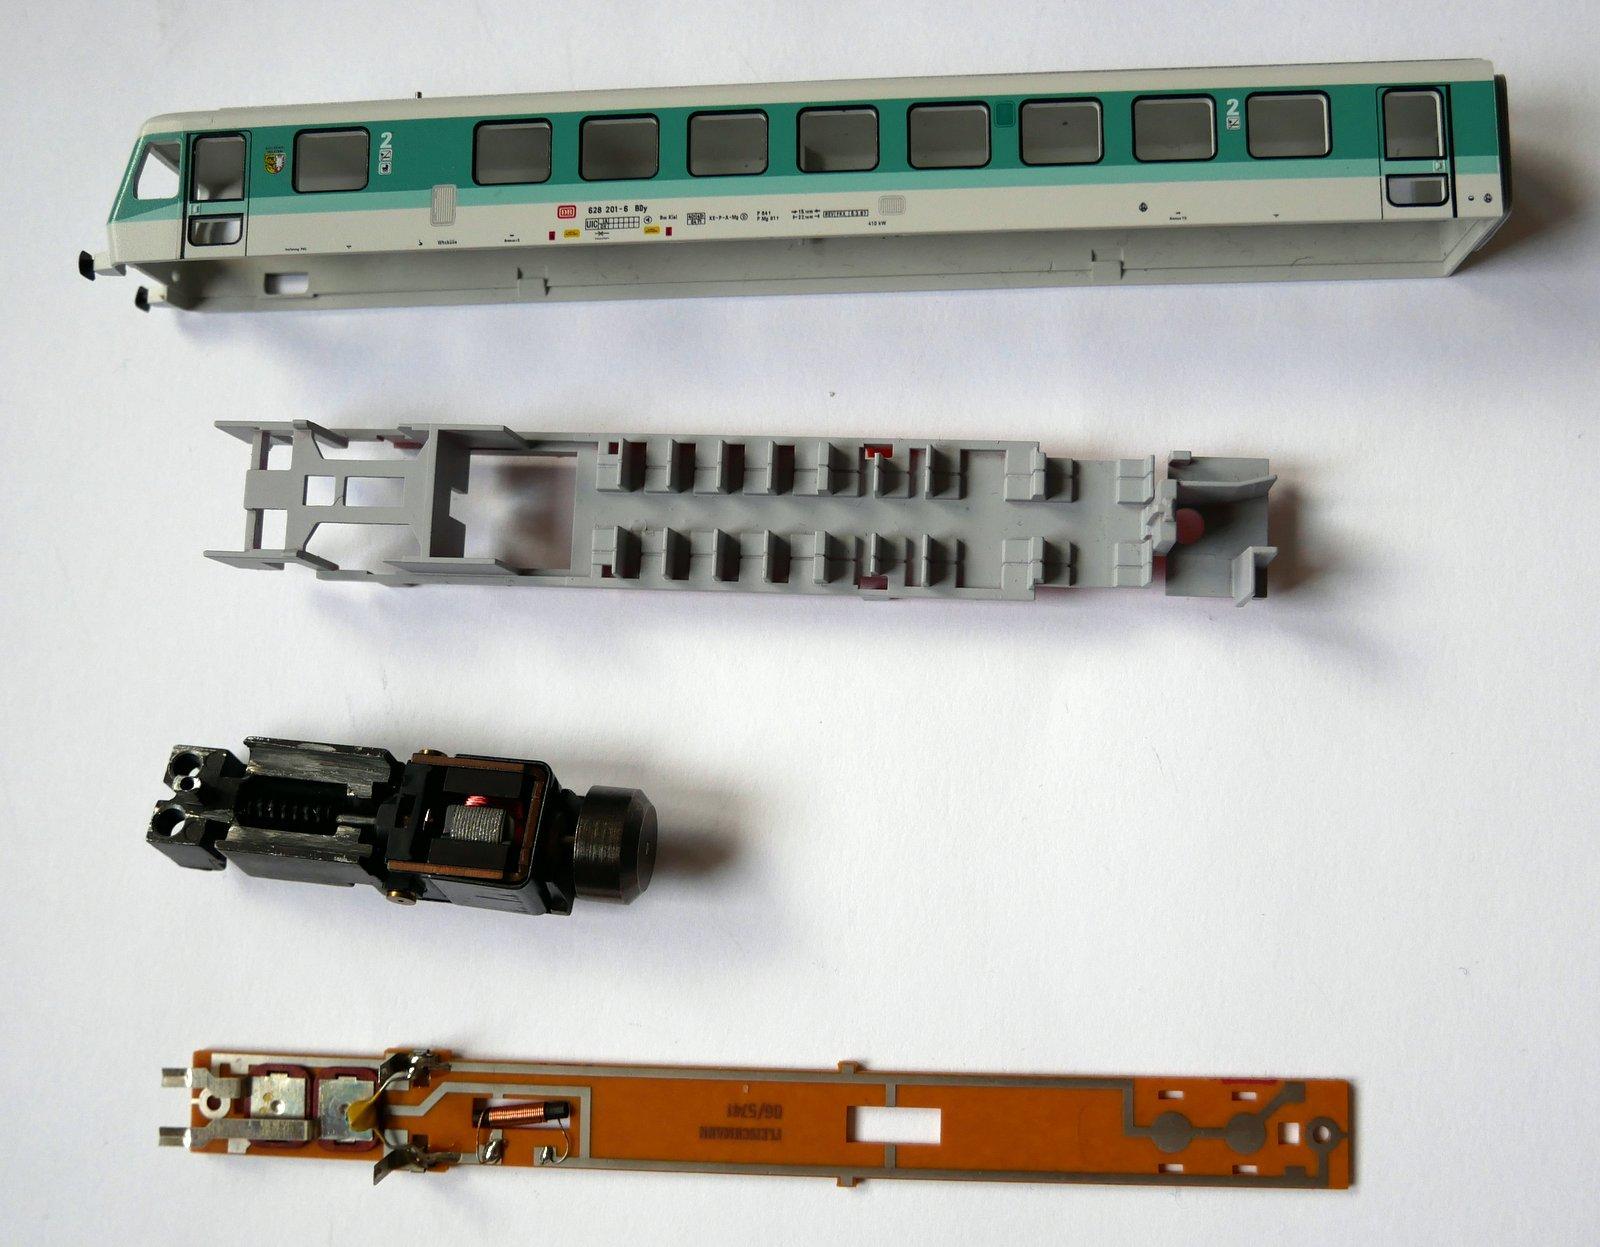 P1140685-001.JPG